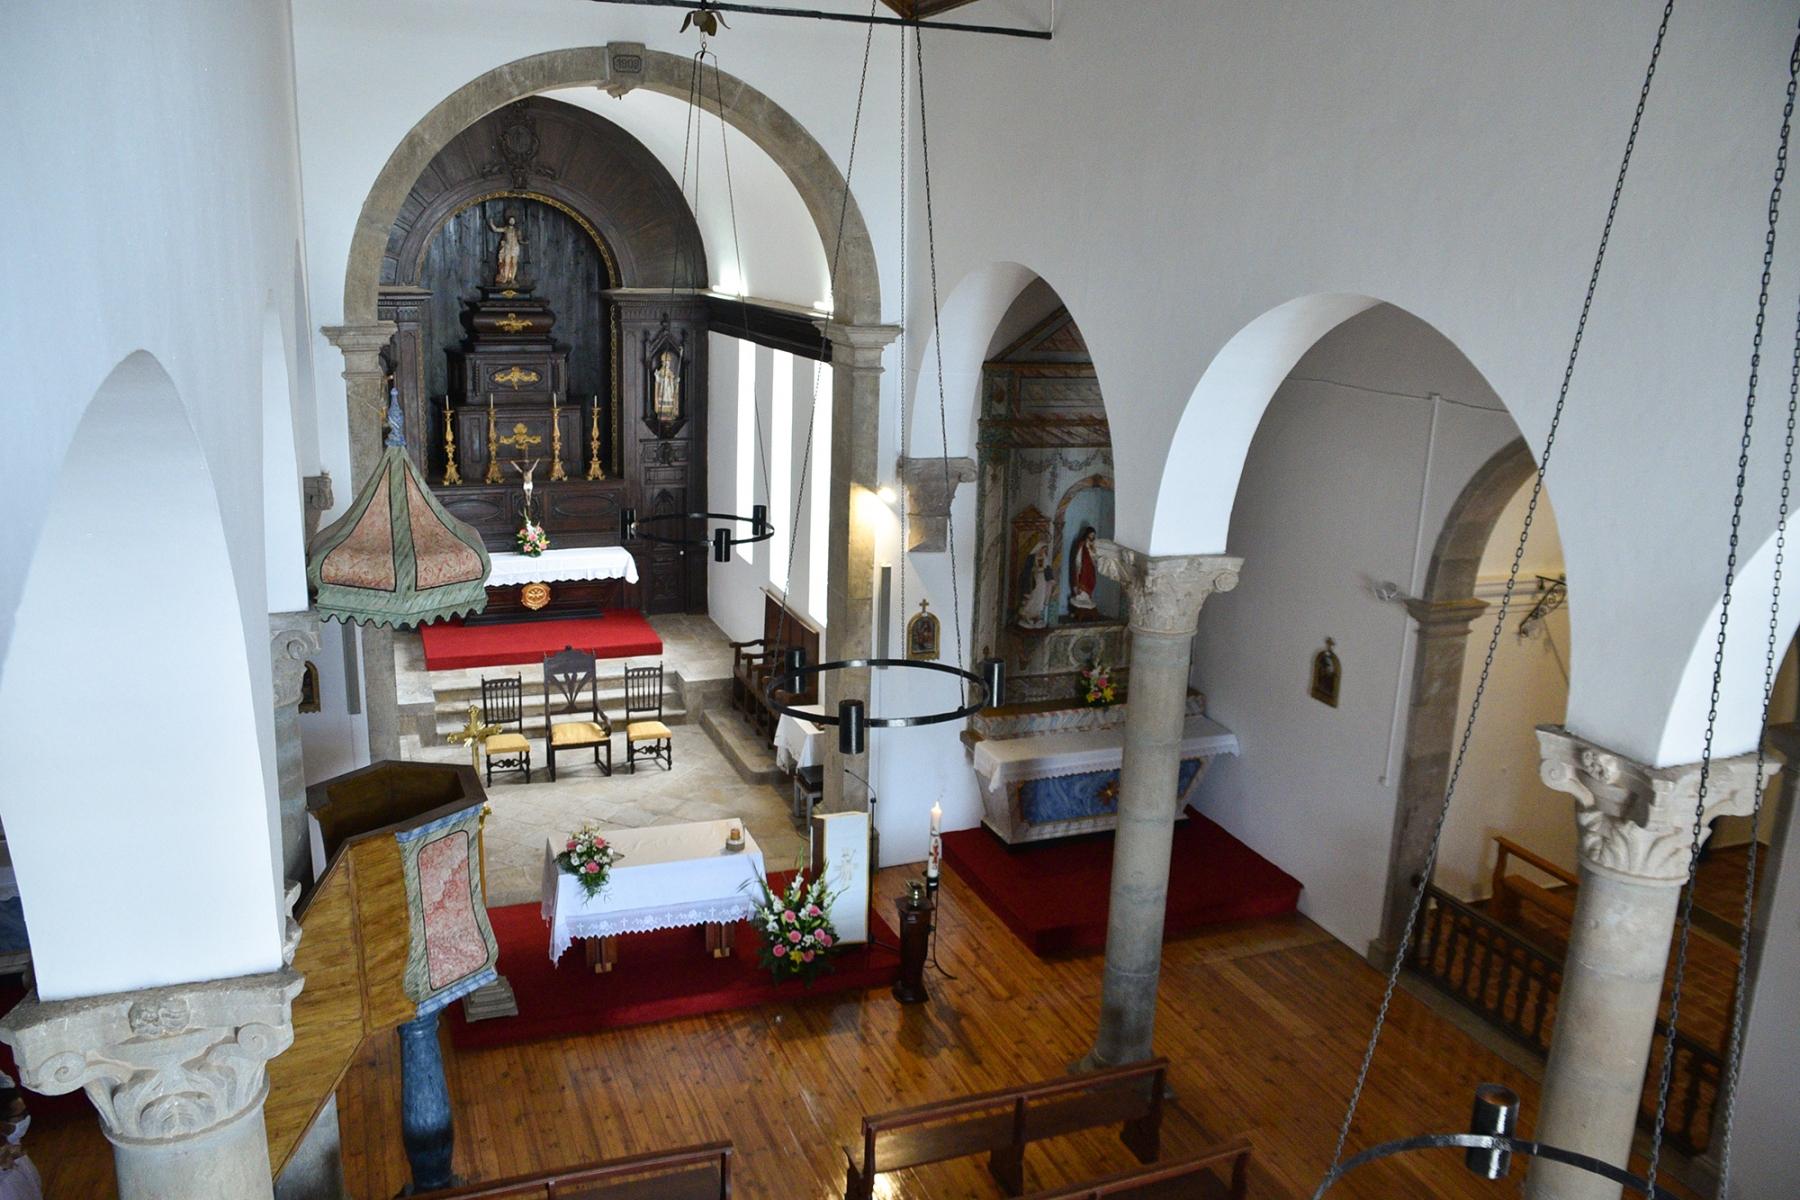 Inauguracao_bencao_obras_restauro_igreja_alcoutim-14